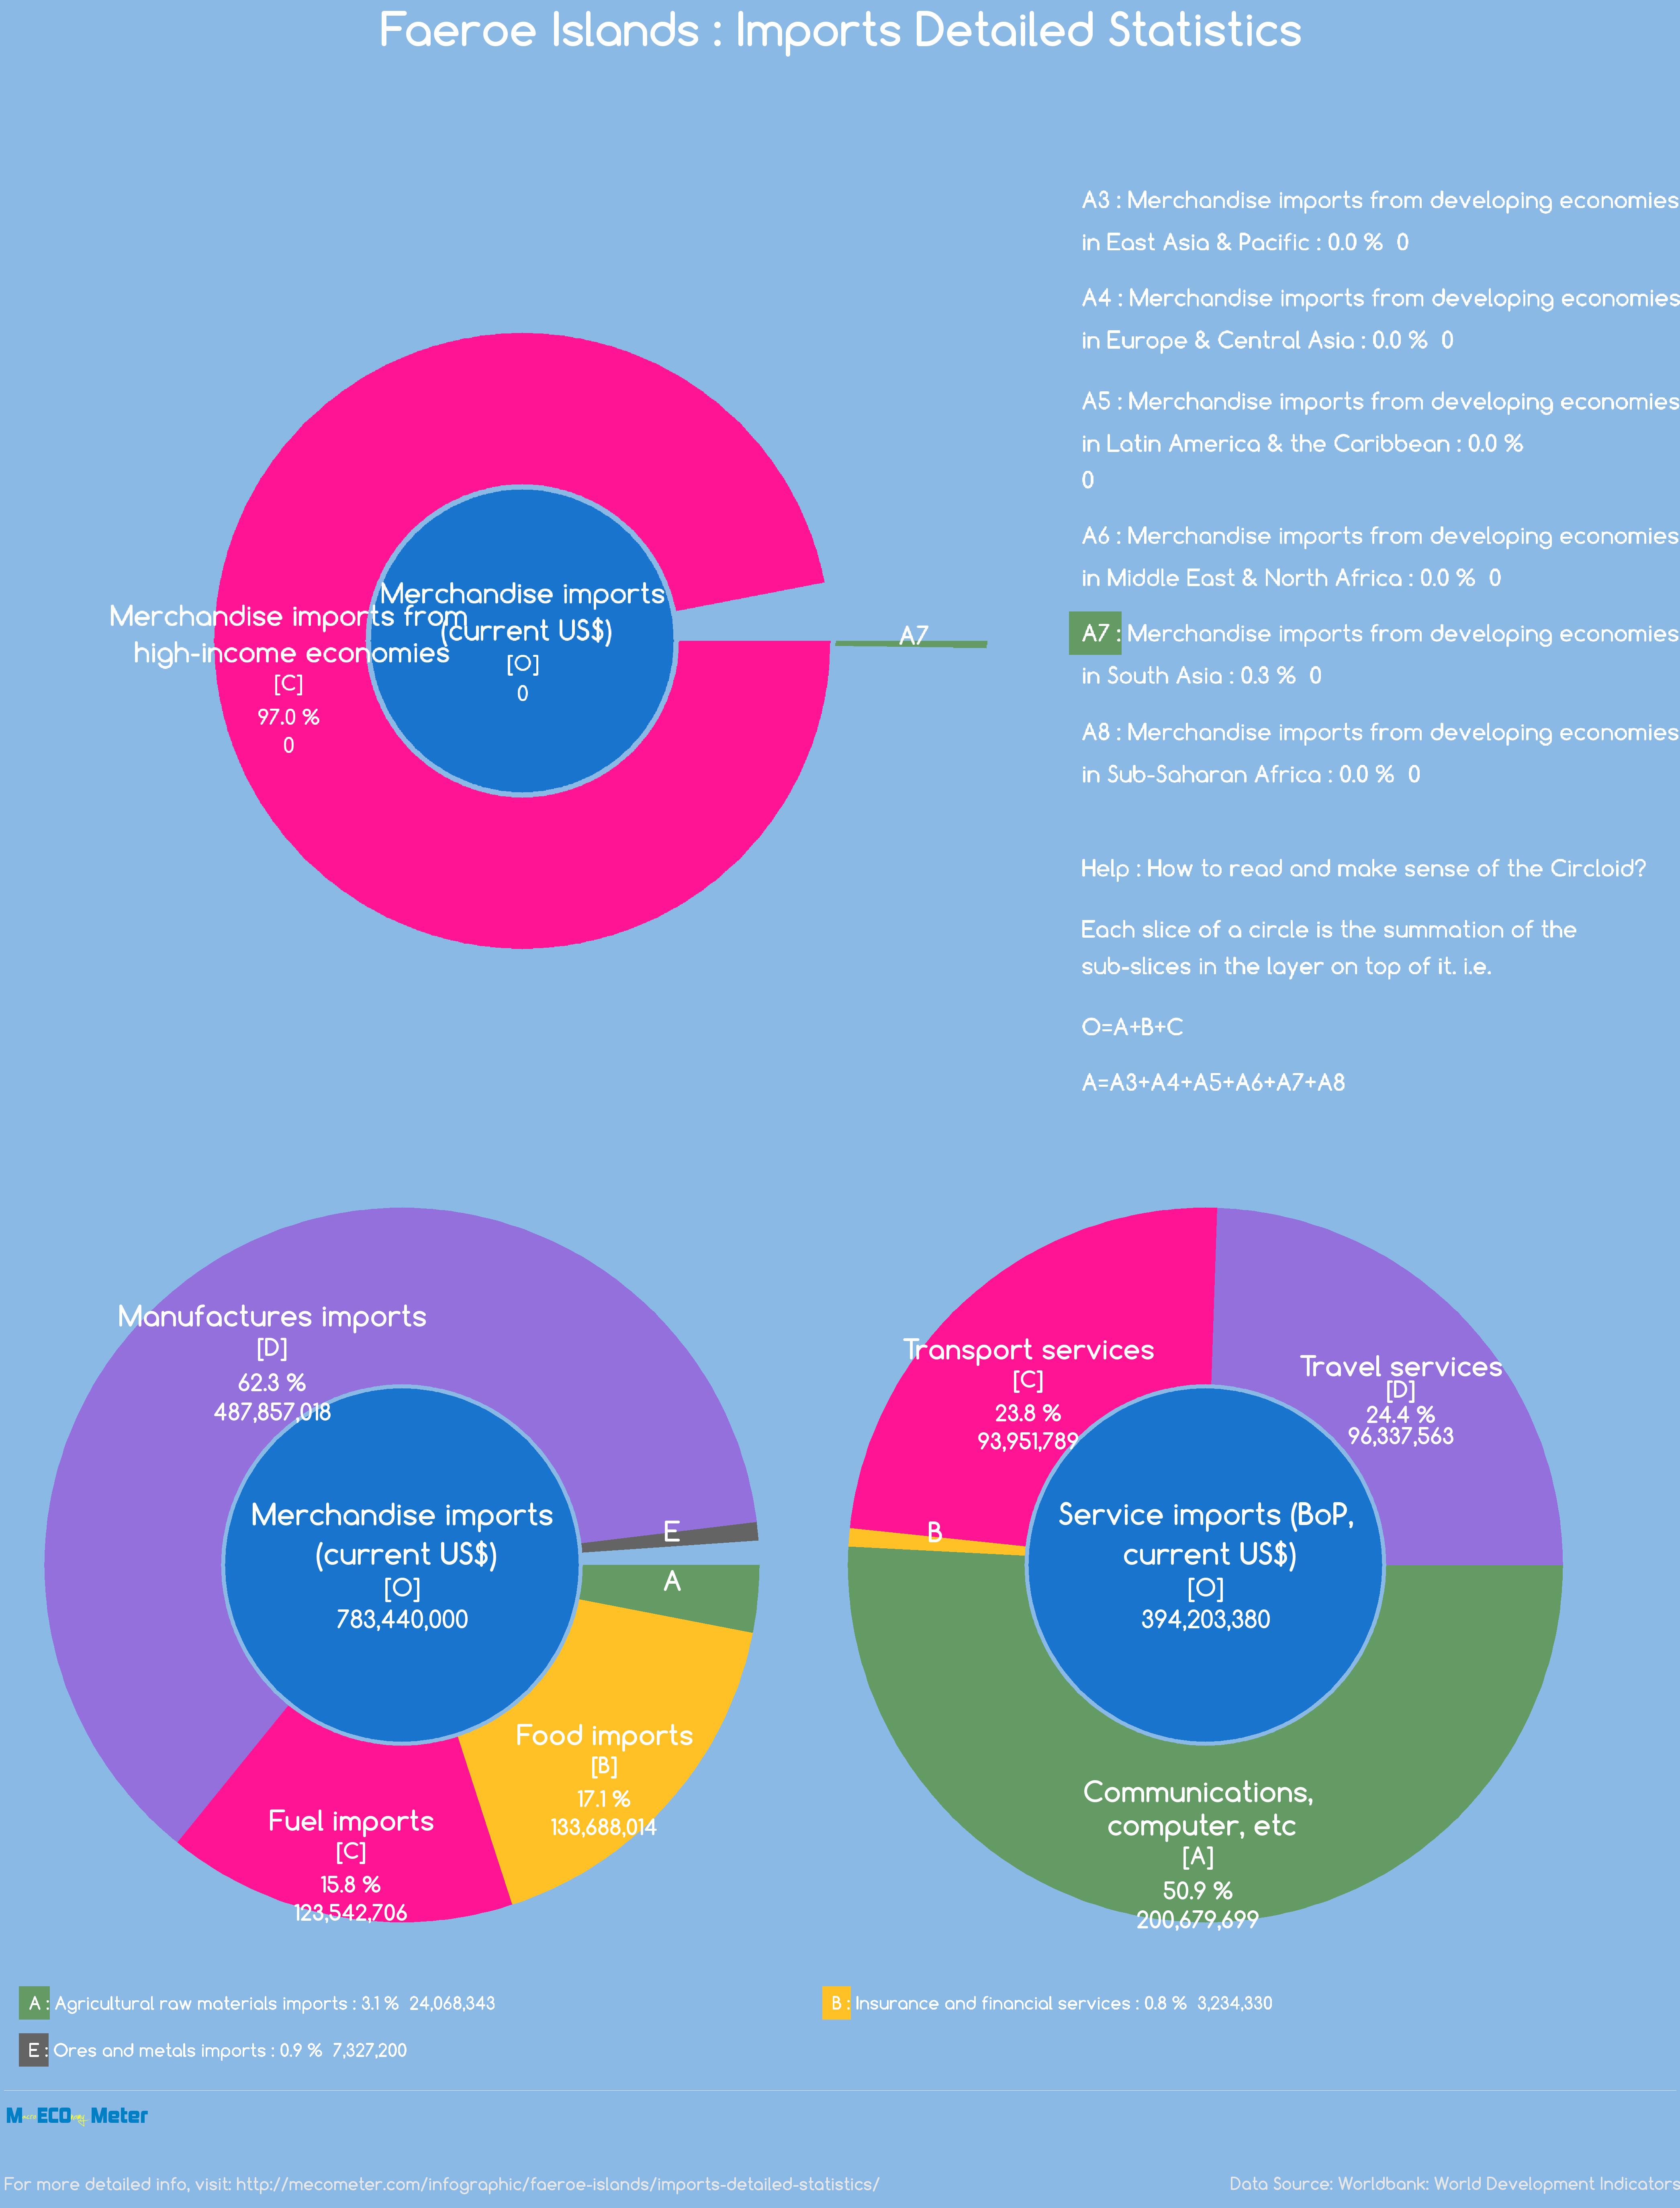 Faeroe Islands : Imports Detailed Statistics